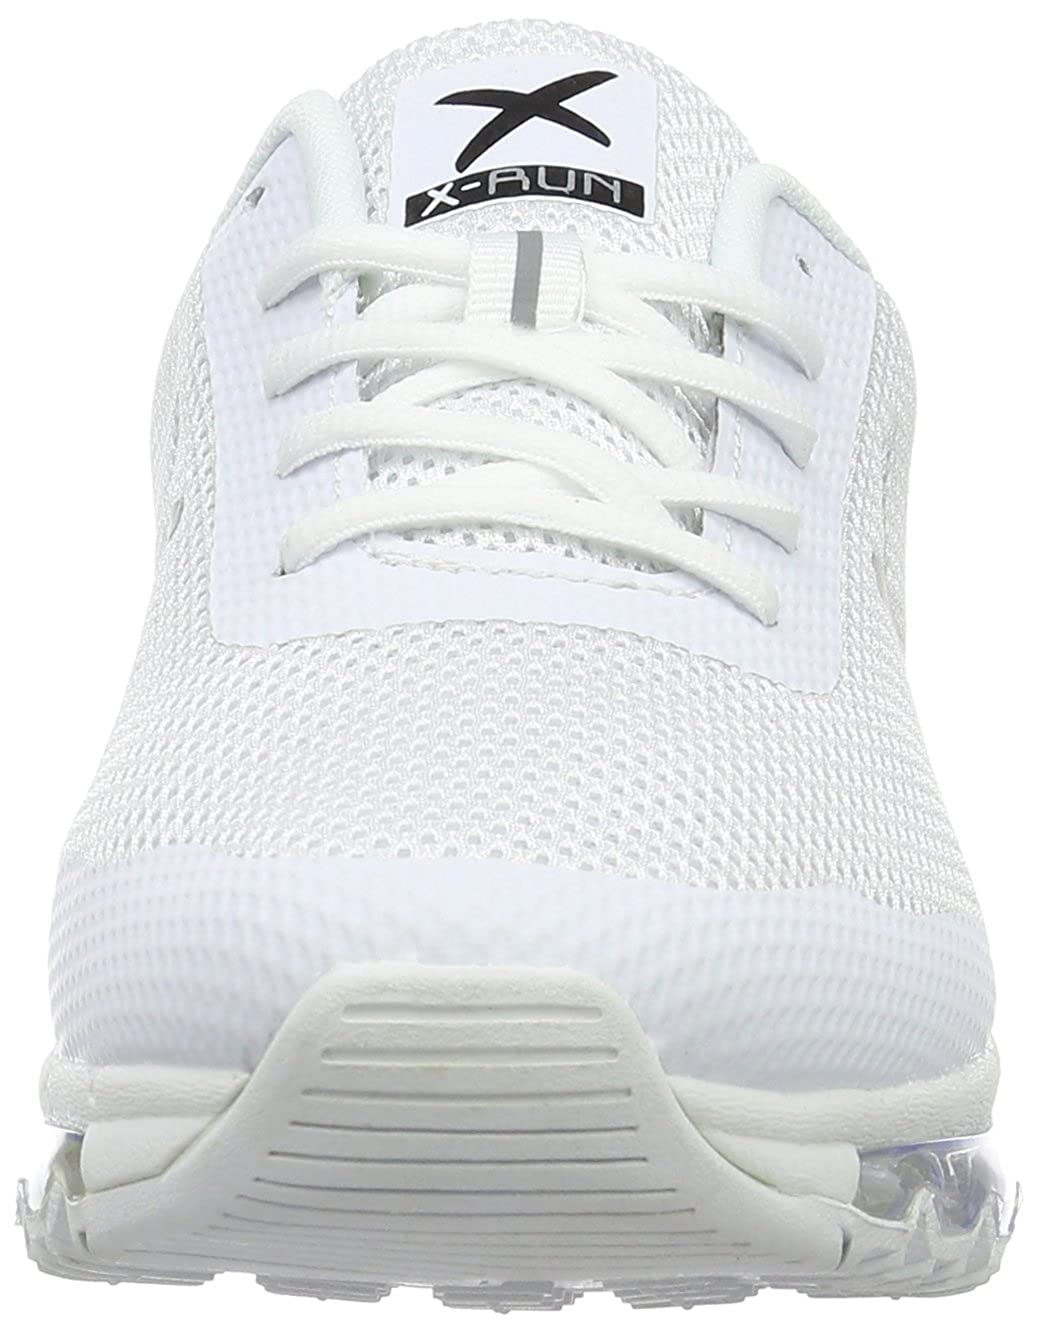 Wize & & & ope - Xrun, scarpe da ginnastica Basse Unisex - Adulto | On-line  02f98f